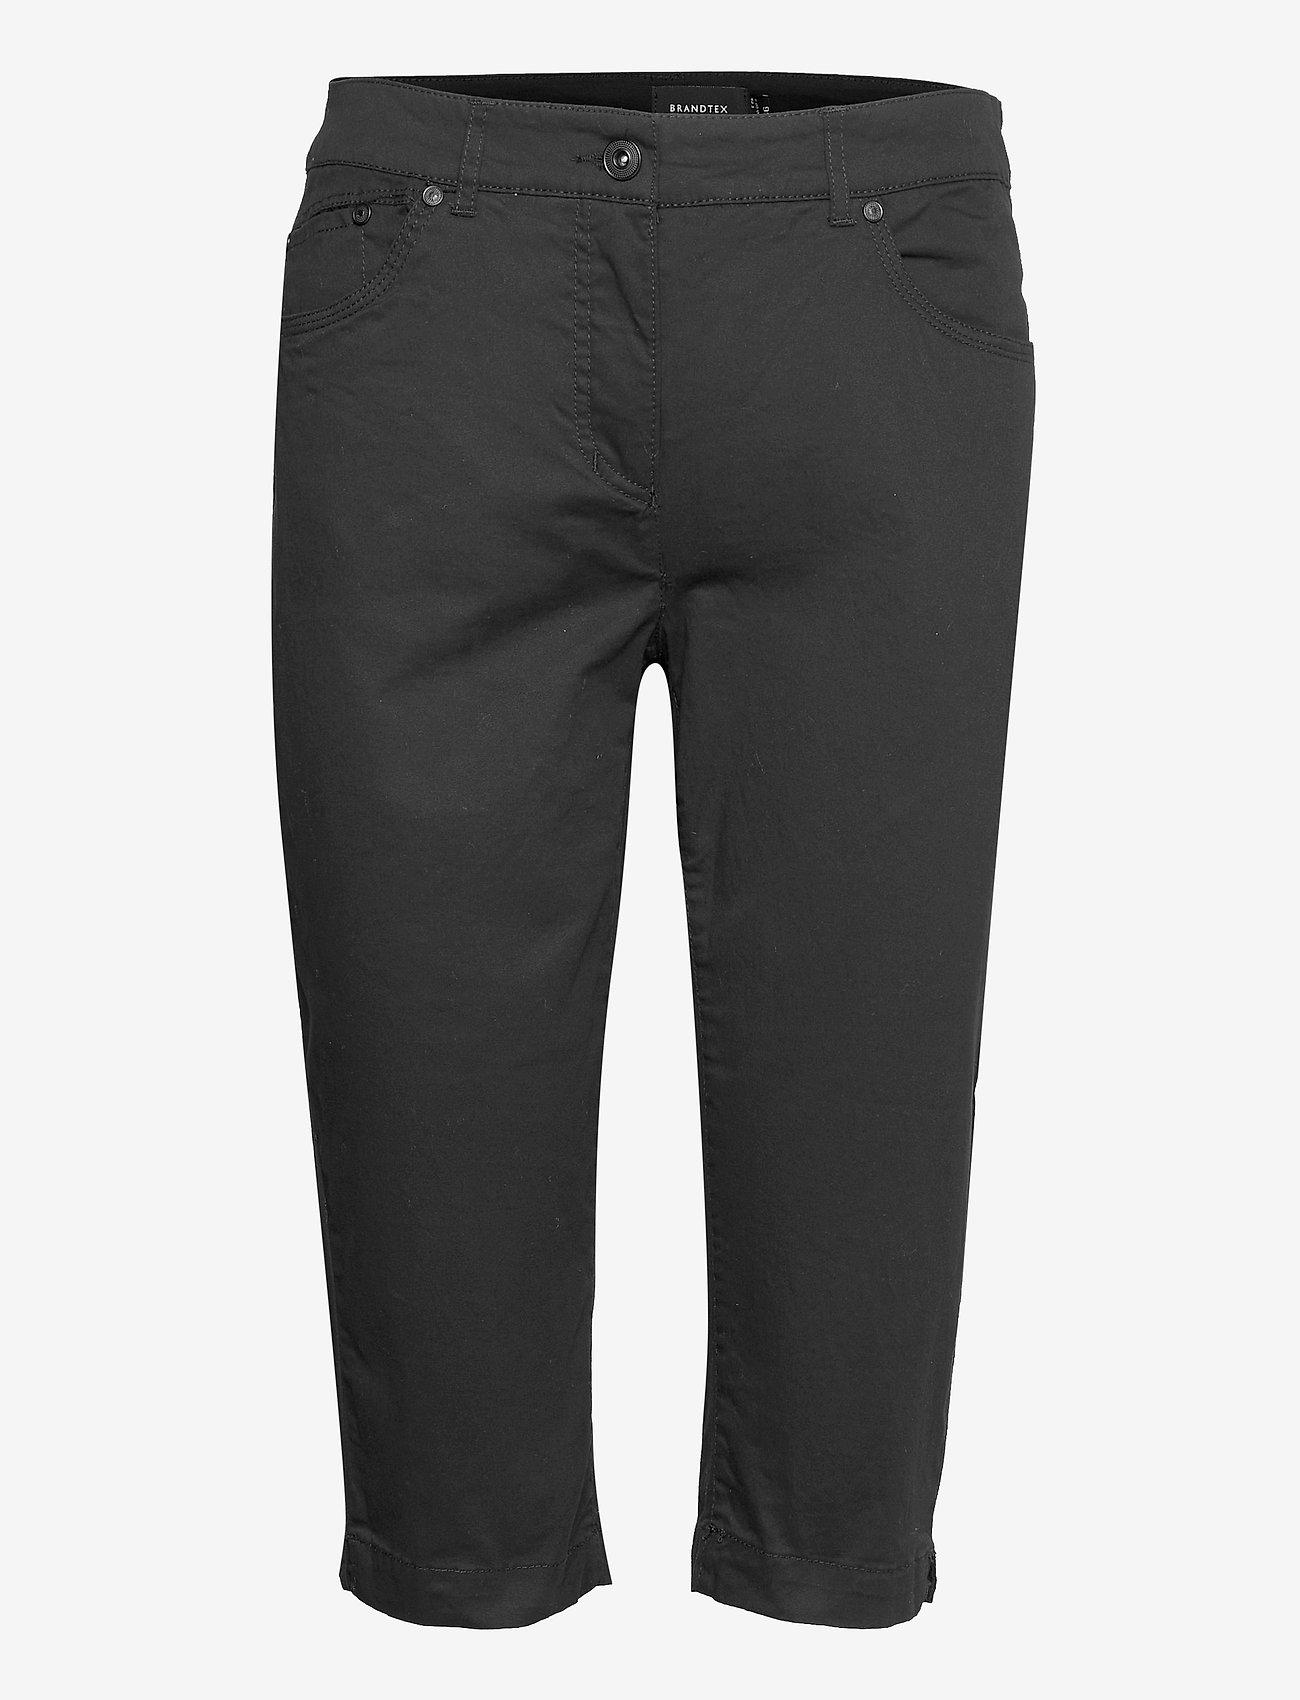 Brandtex - Capri pants - capri bukser - black - 1